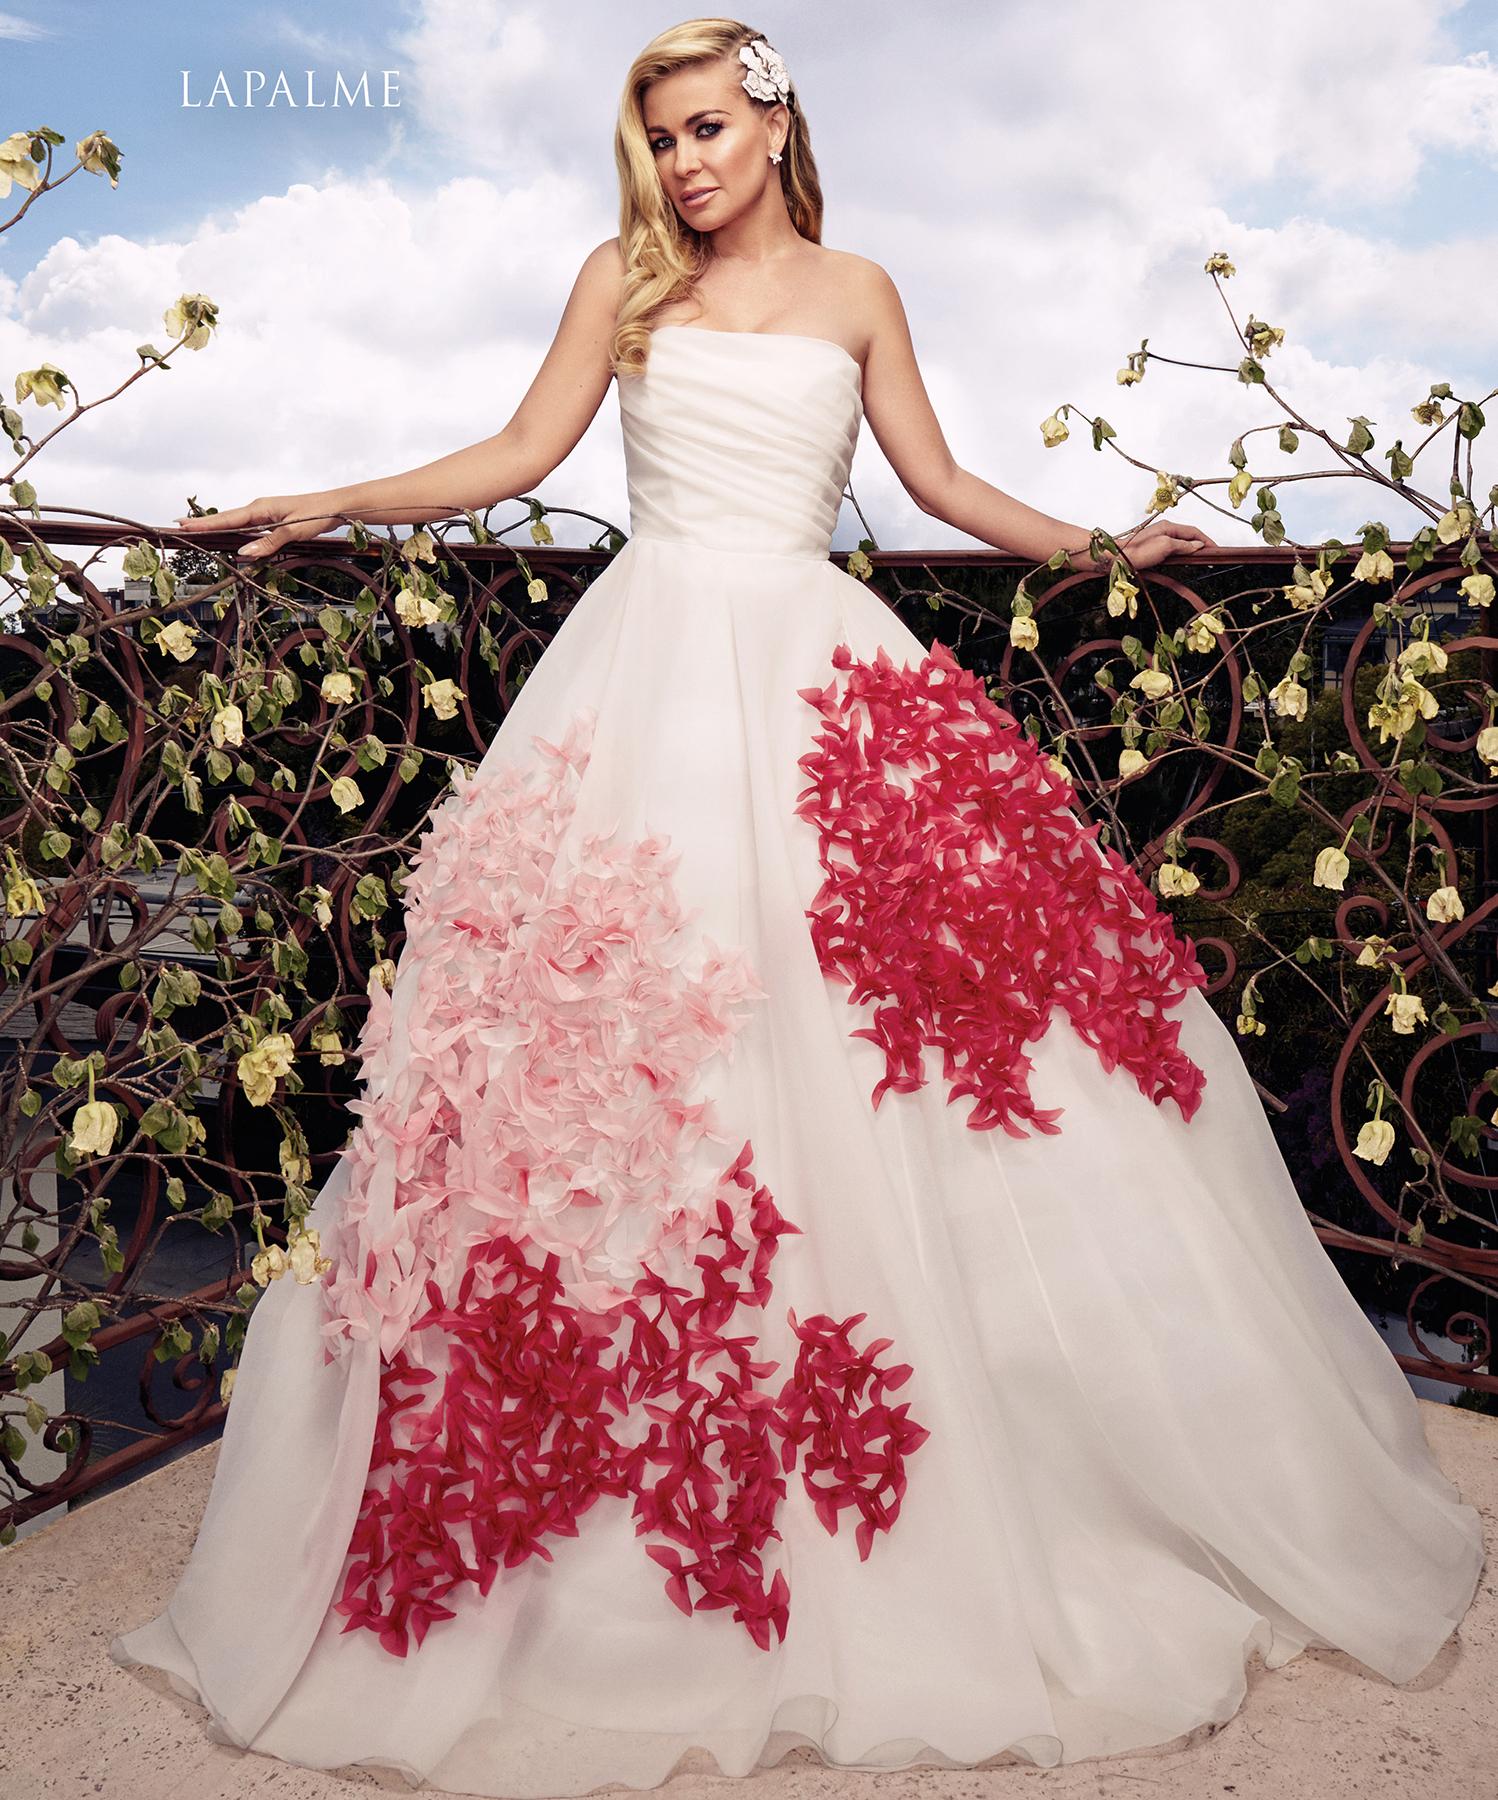 Moderno Vestido De Novia De Peyton Sawyer Patrón - Ideas de Estilos ...